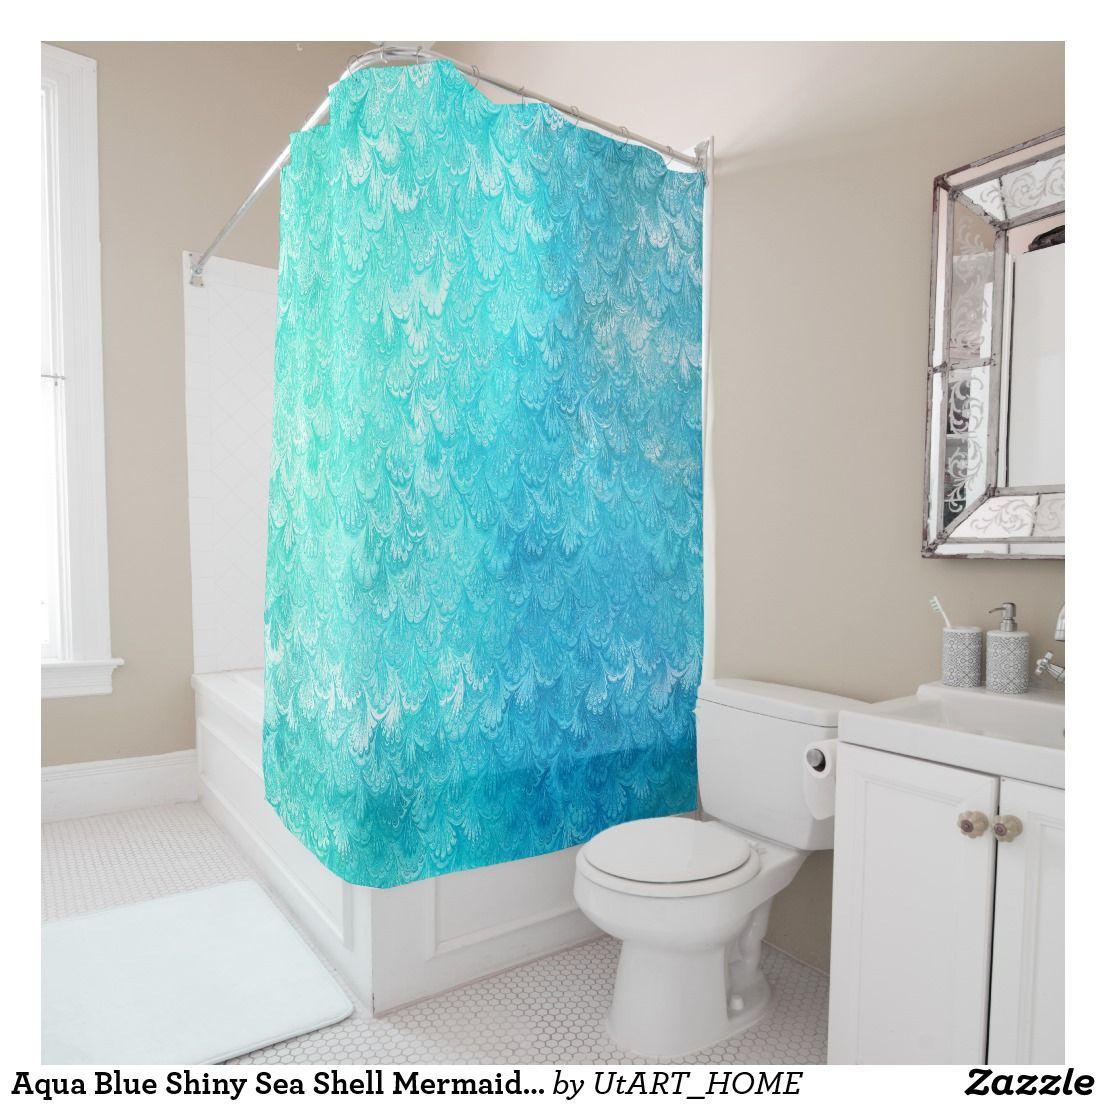 Aqua Blue Shiny Sea Shell Mermaid Fish Scales Shower Curtain Beautiful Teal Shining Feminine And Elegant In Different Shades Of Turqoise